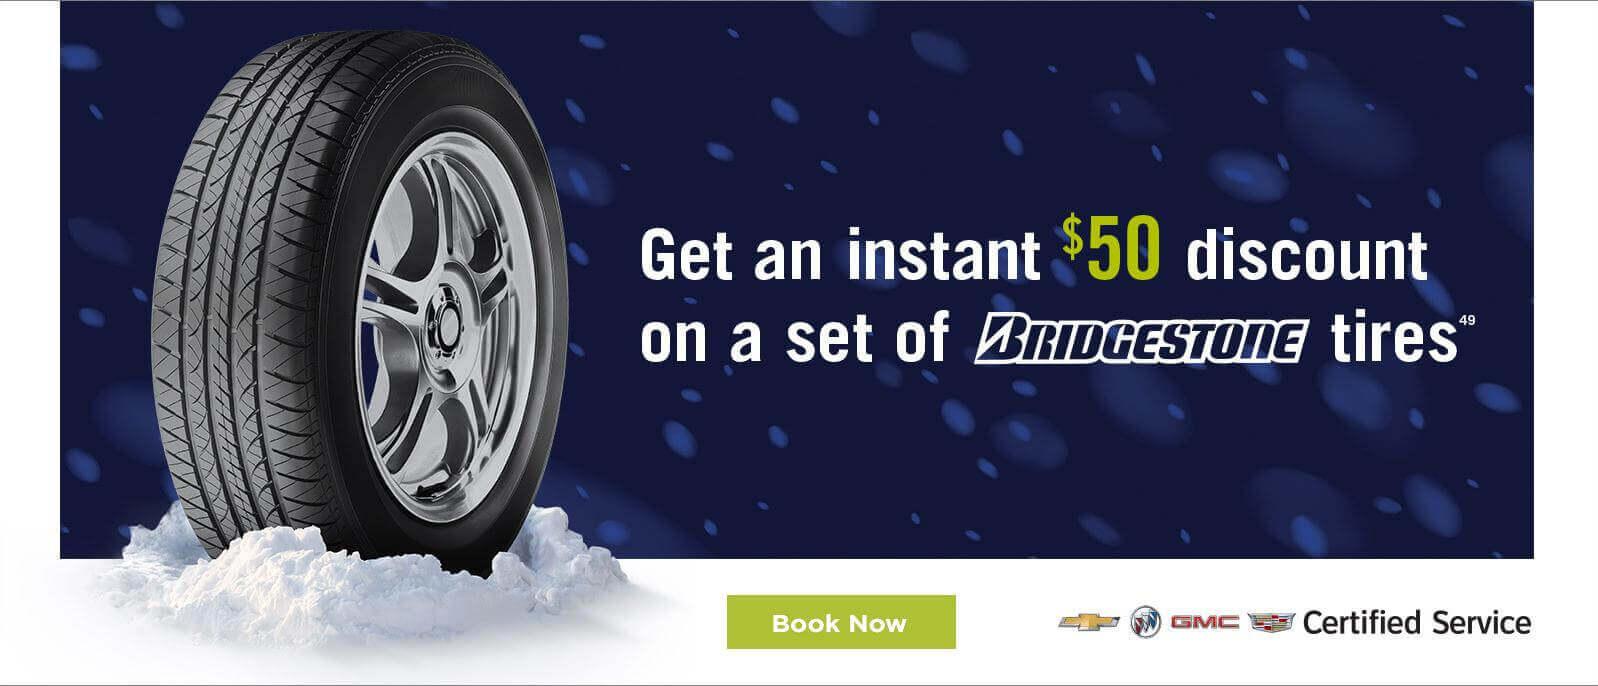 Bridgestone $50 offer